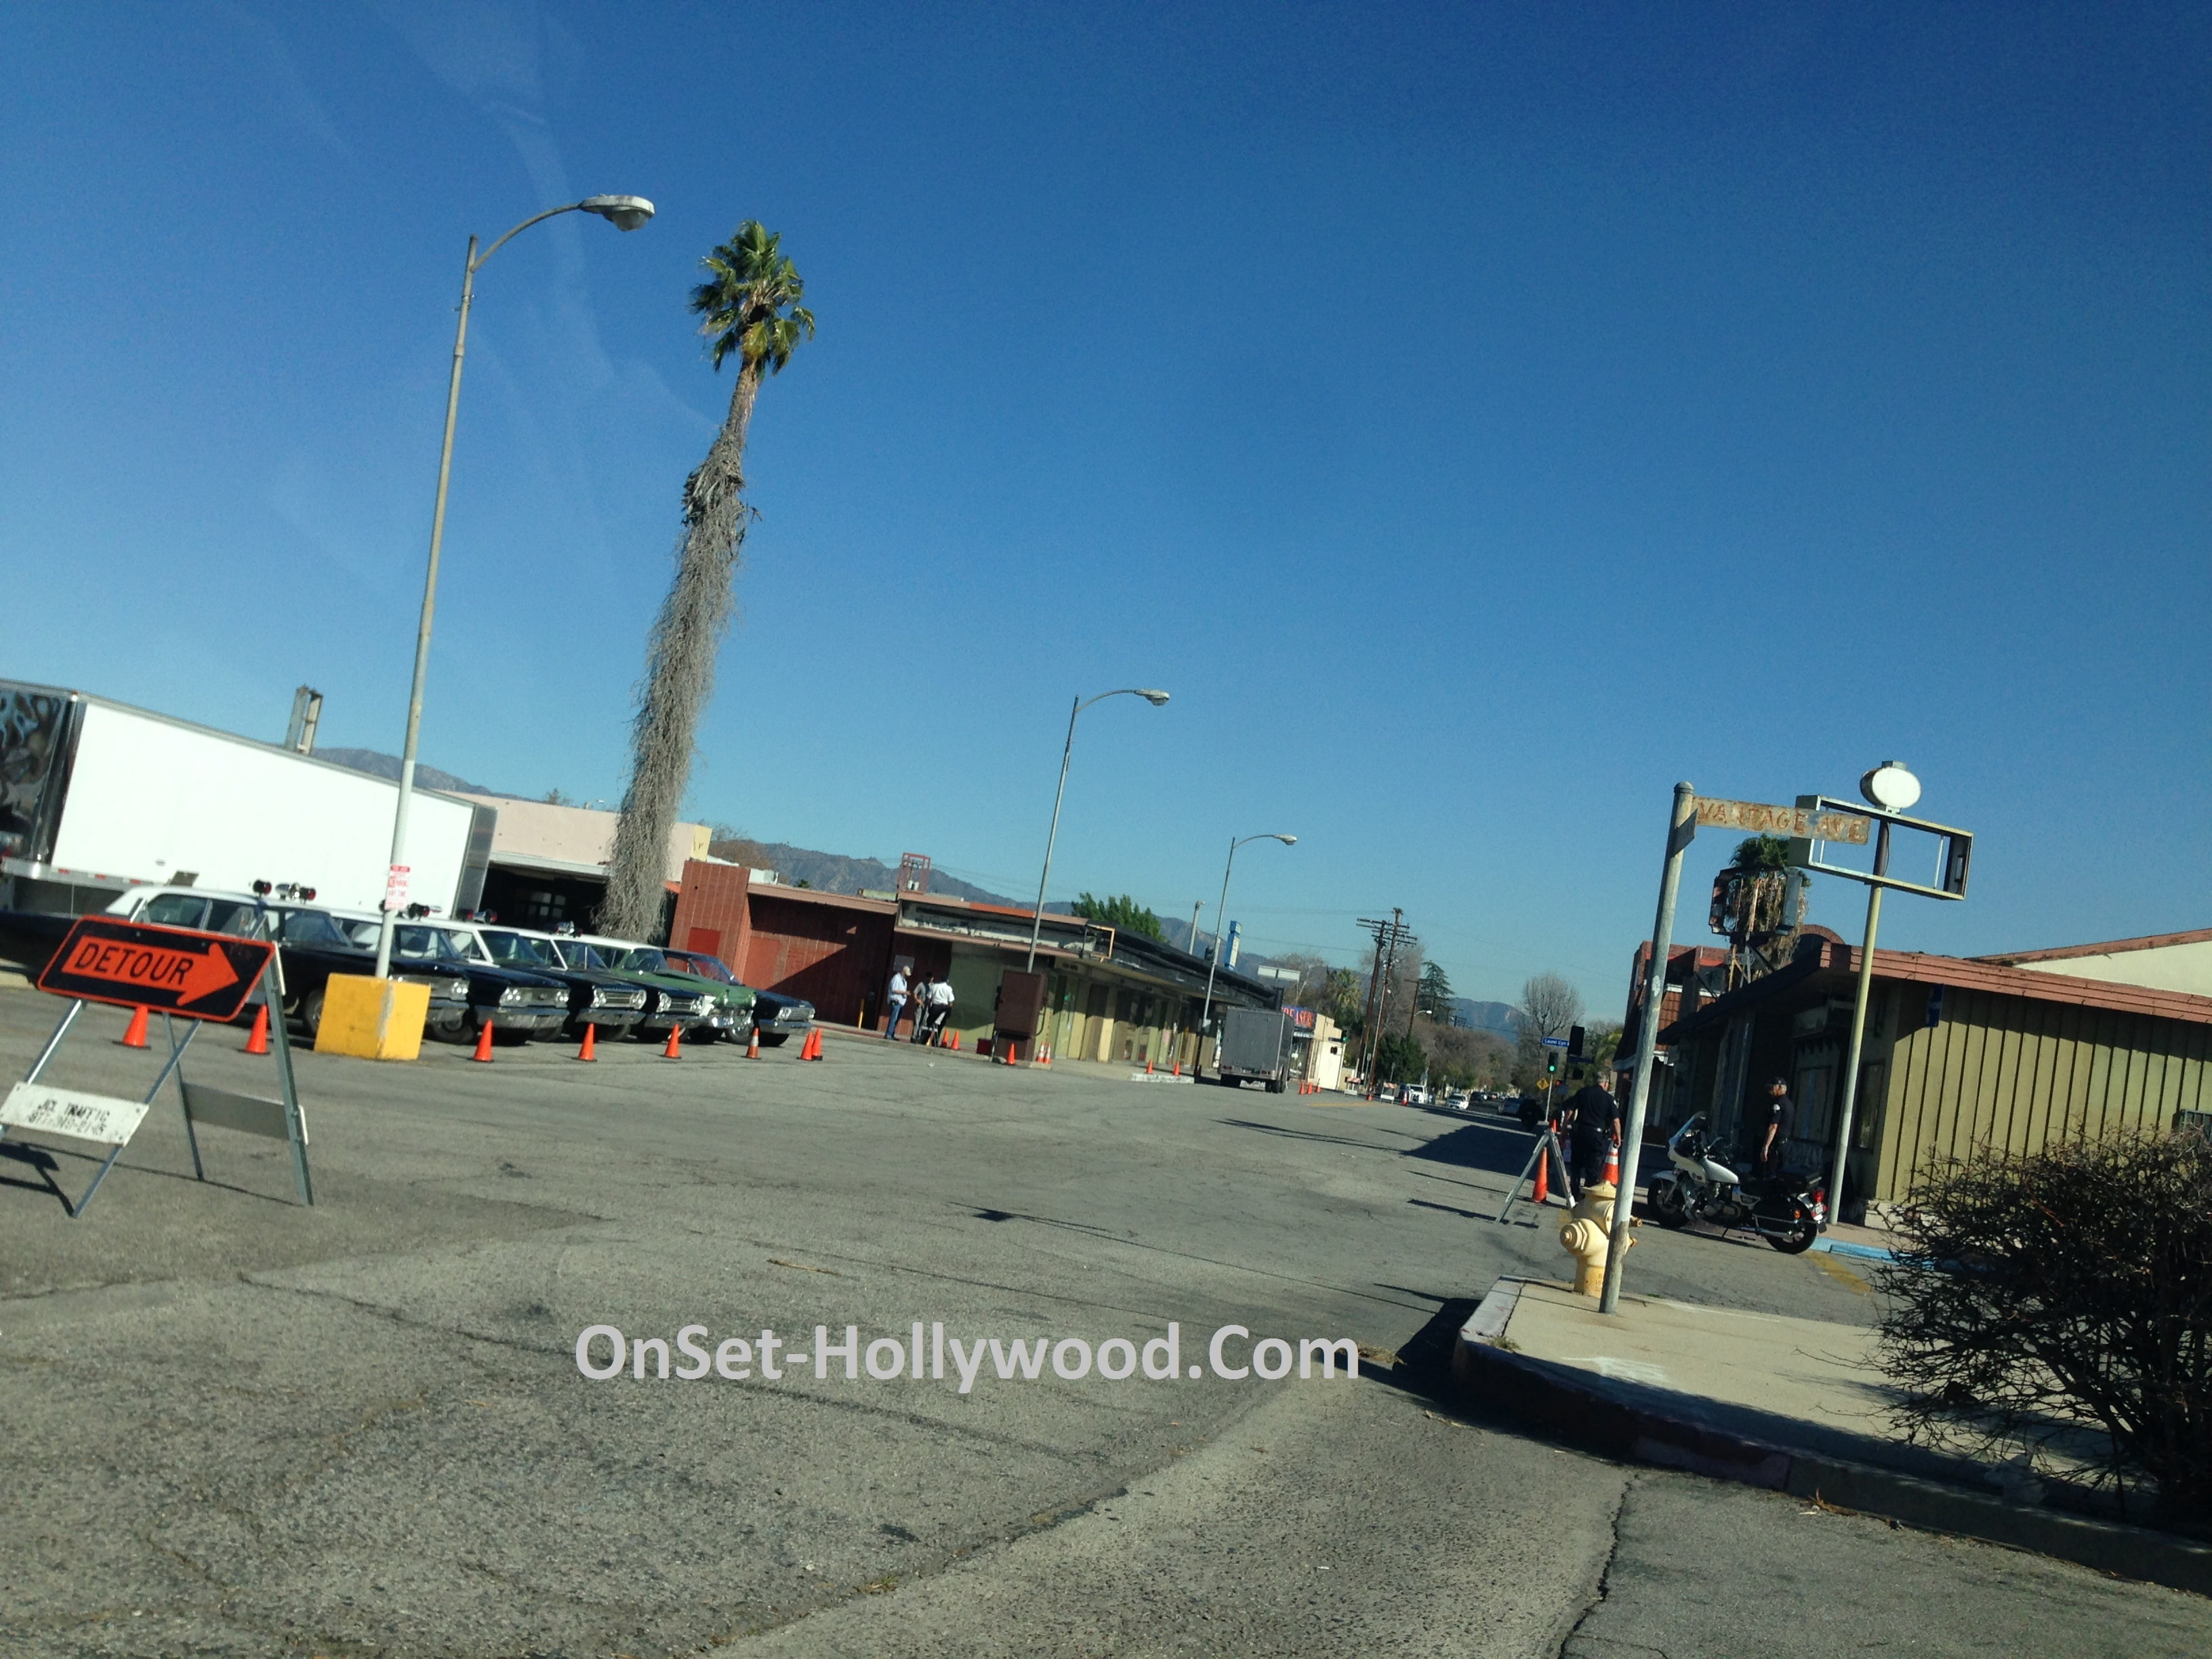 Aquarius-filming-location-north-hollywood